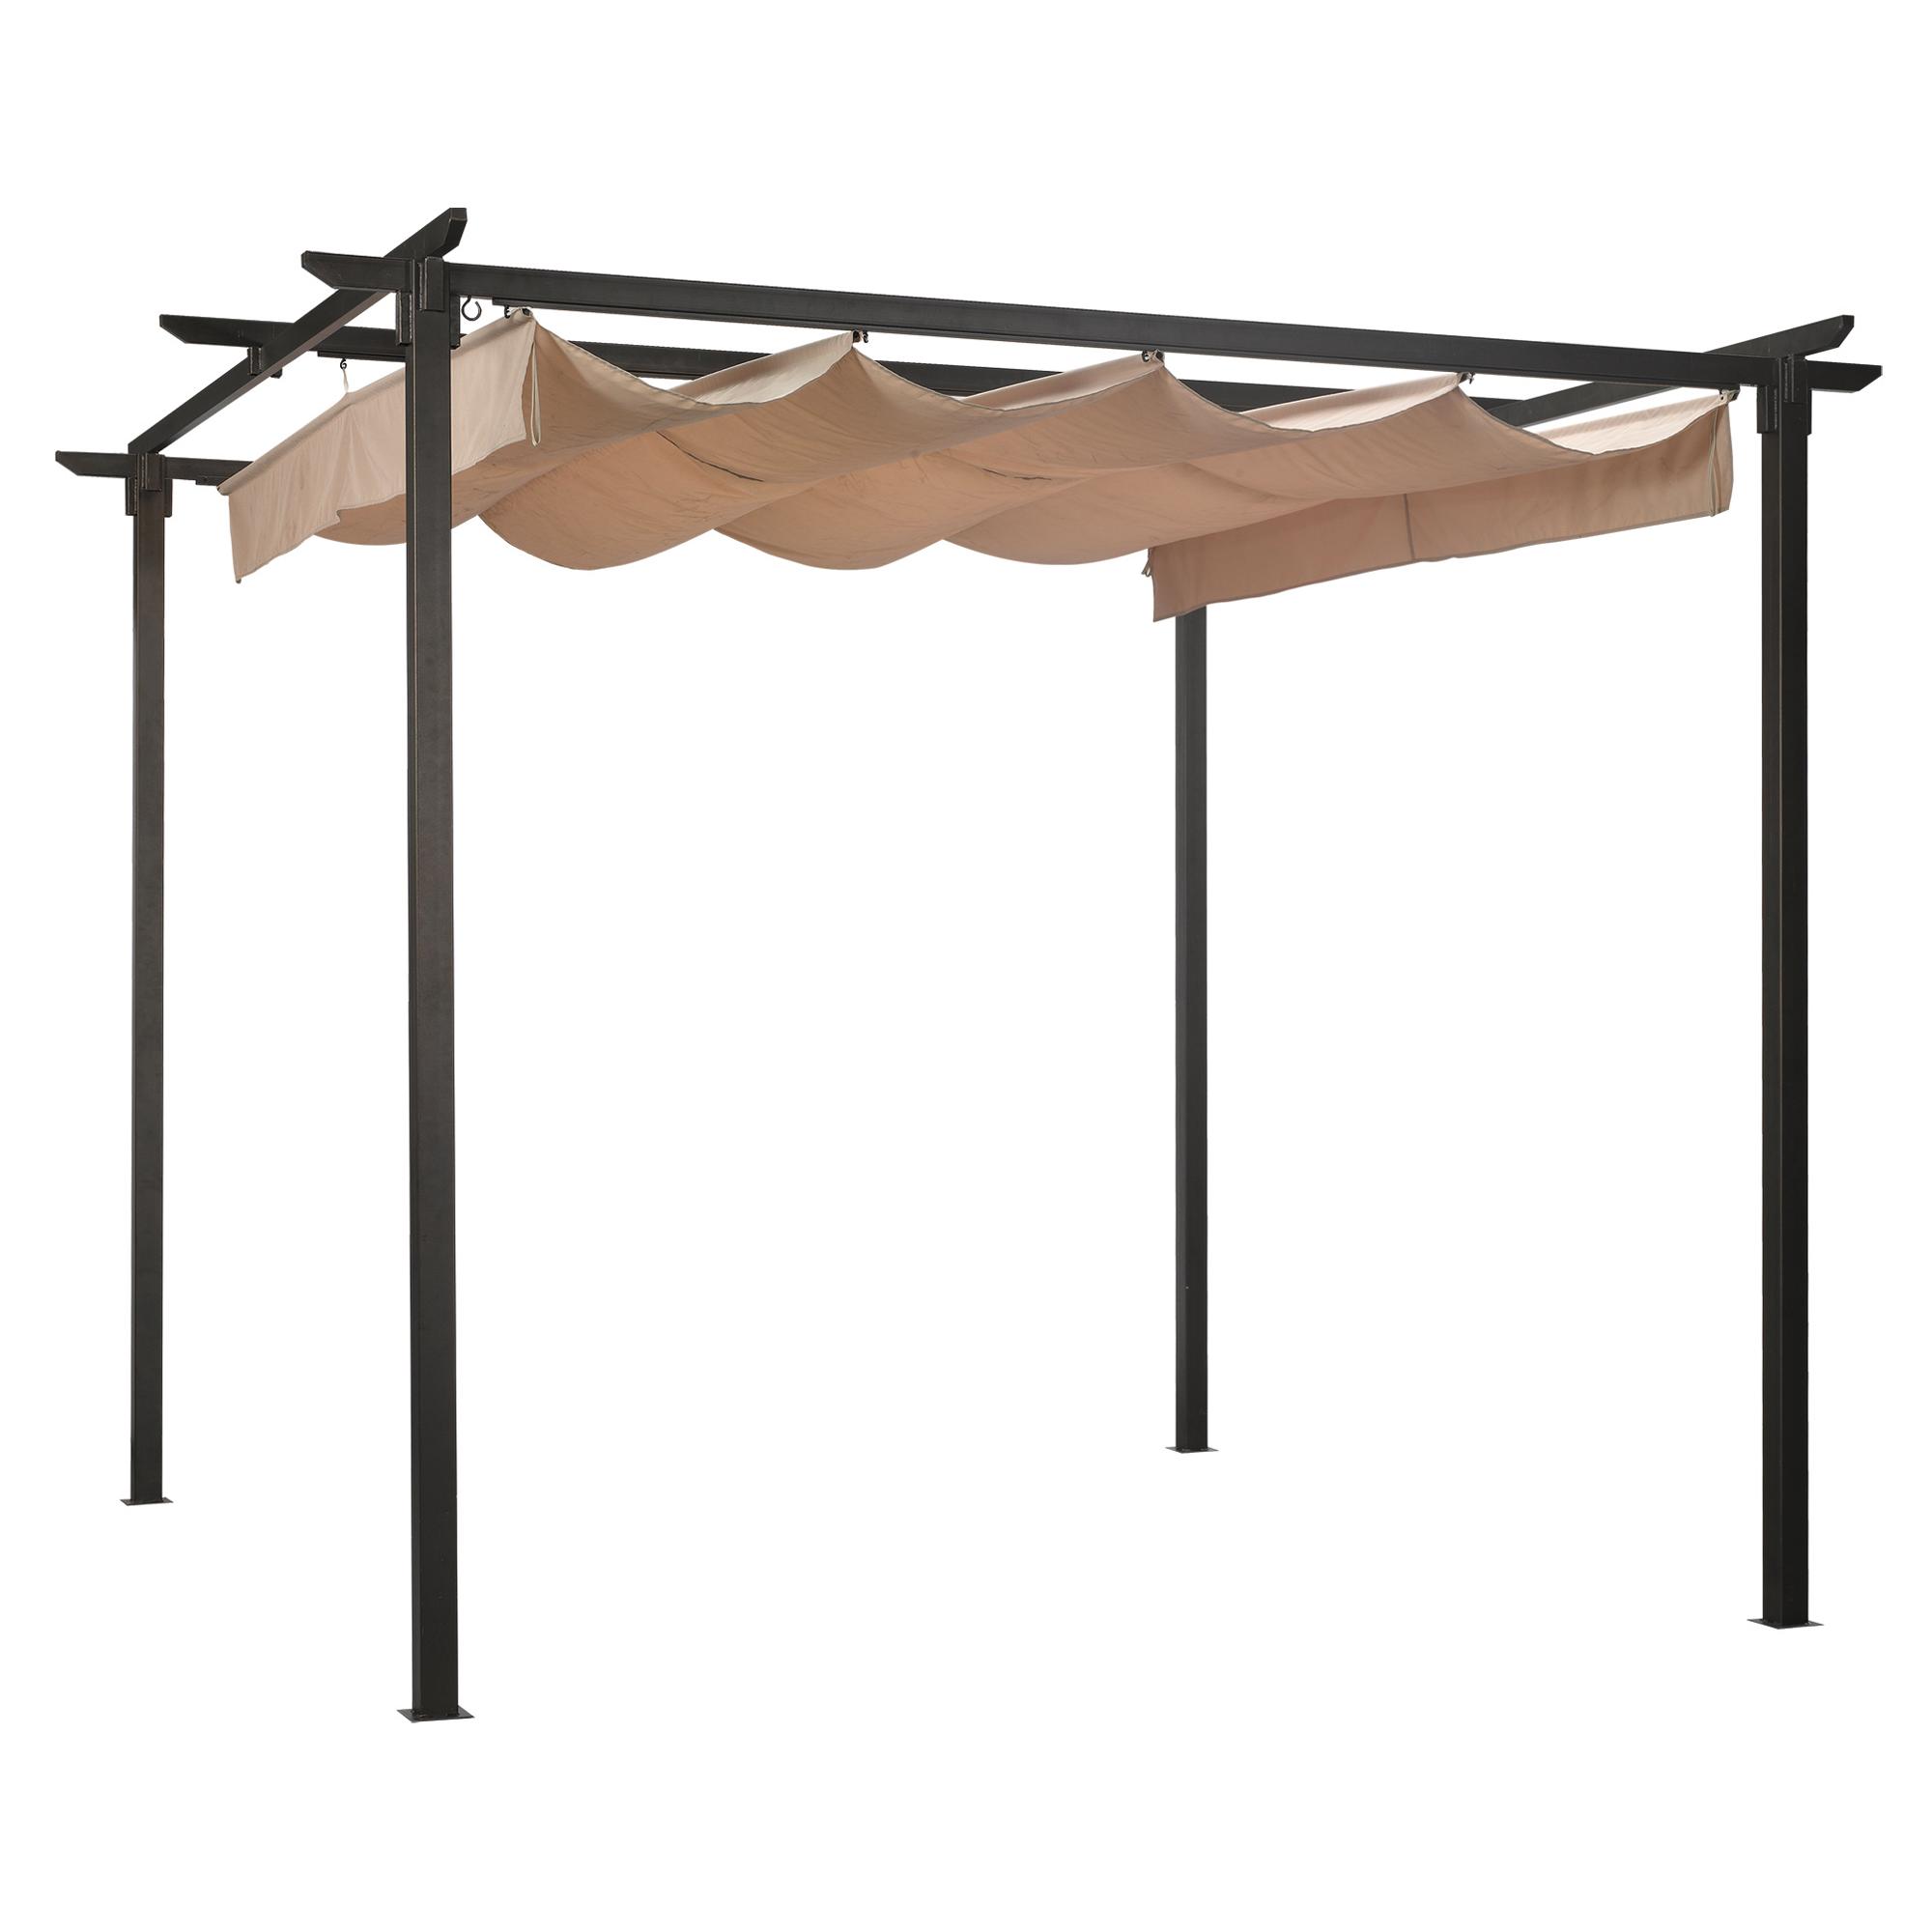 pavillon 3x4 wasserdicht top aus lkw plane x with pavillon 3x4 wasserdicht gallery of uloriu. Black Bedroom Furniture Sets. Home Design Ideas